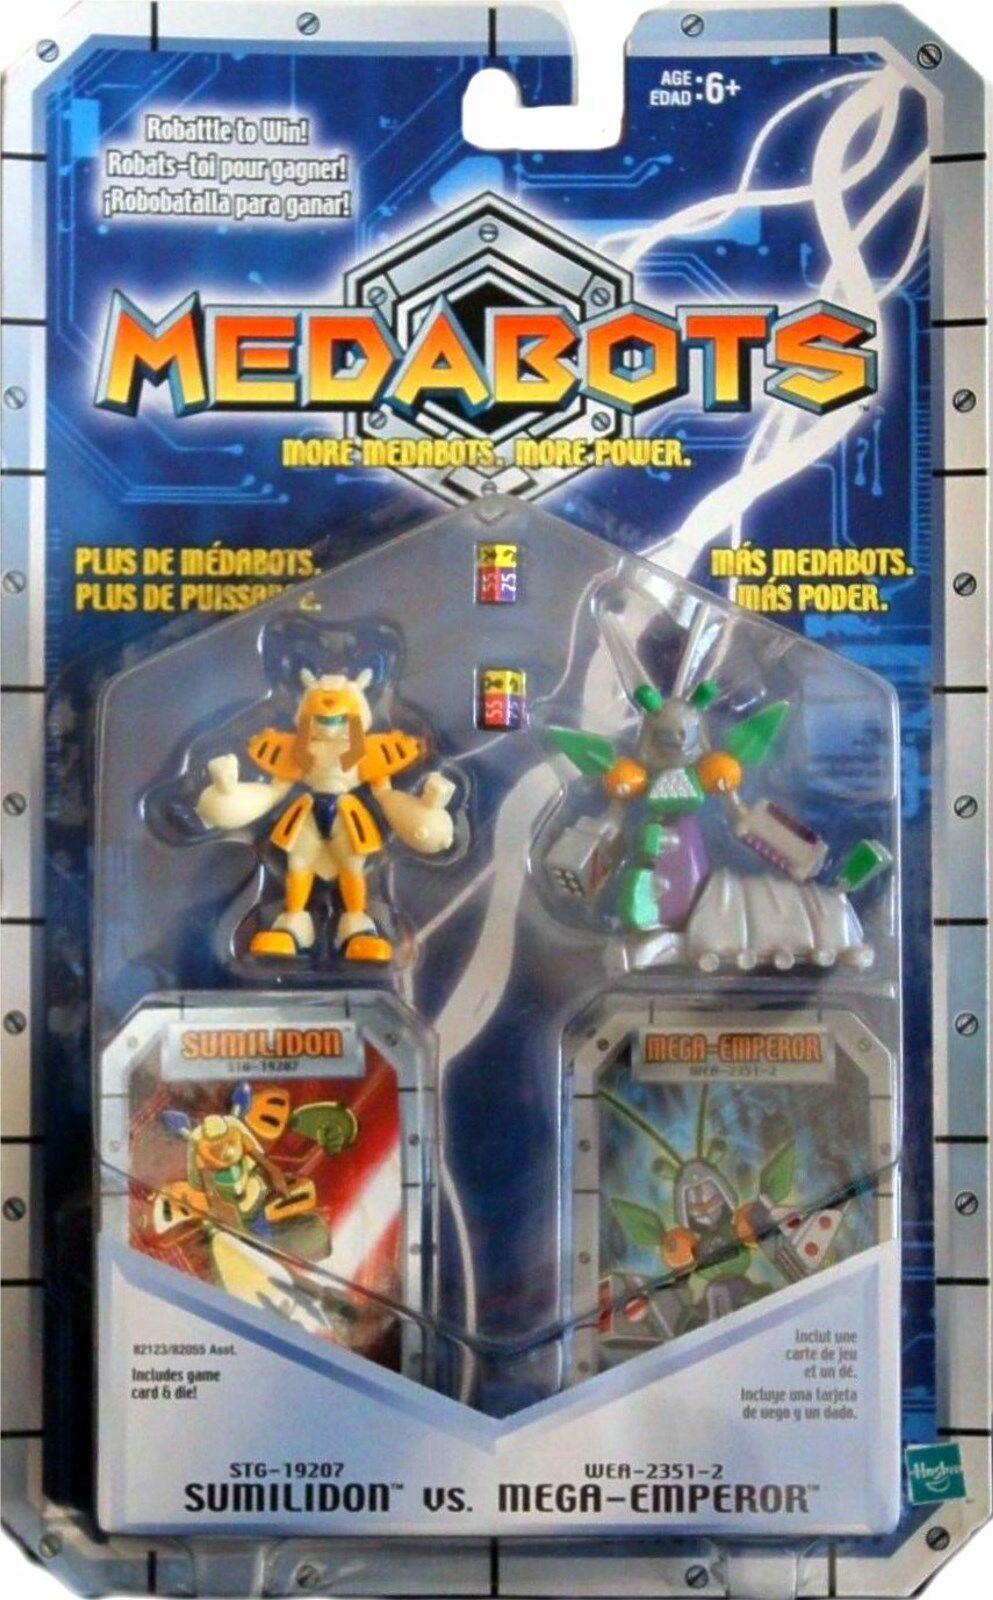 Medabots 2  Sumilidon VS Mega-Emperor Nuovo Factory Sealed Hasbro Medarot 1997